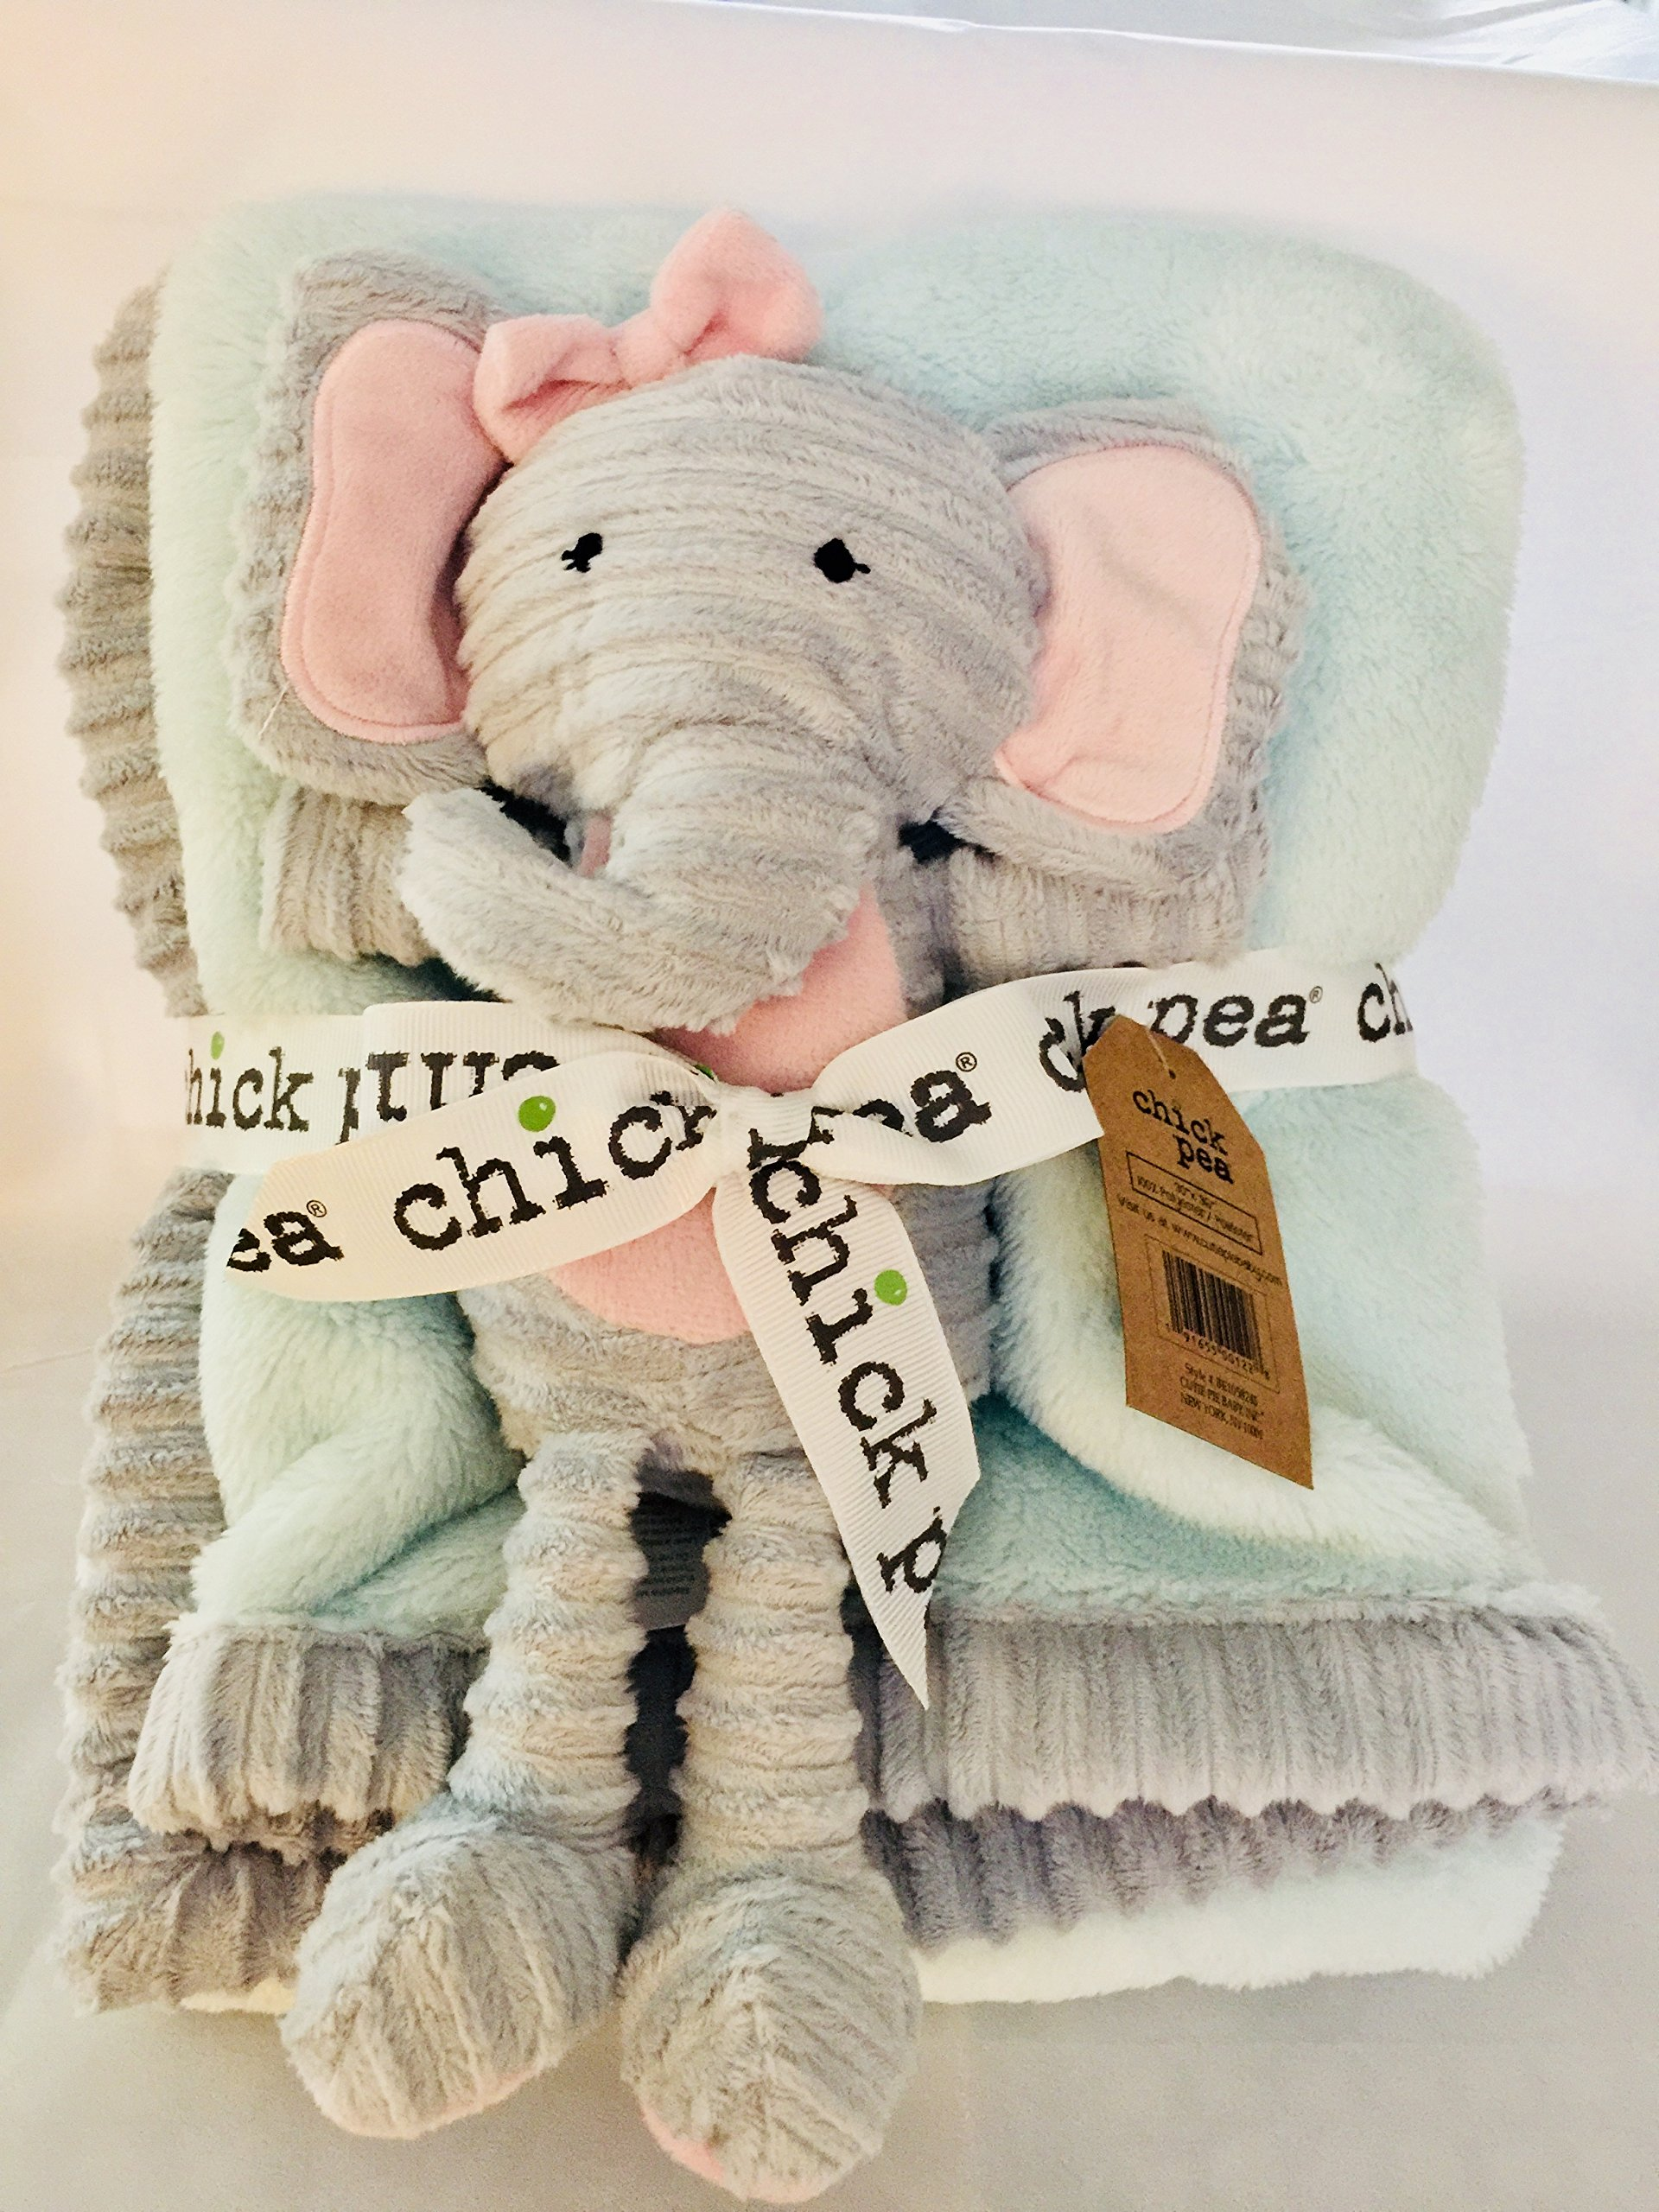 Chick Pea Baby Velboa Plush 2 Piece Blanket and Animal Toy Set, turquoise Blanket